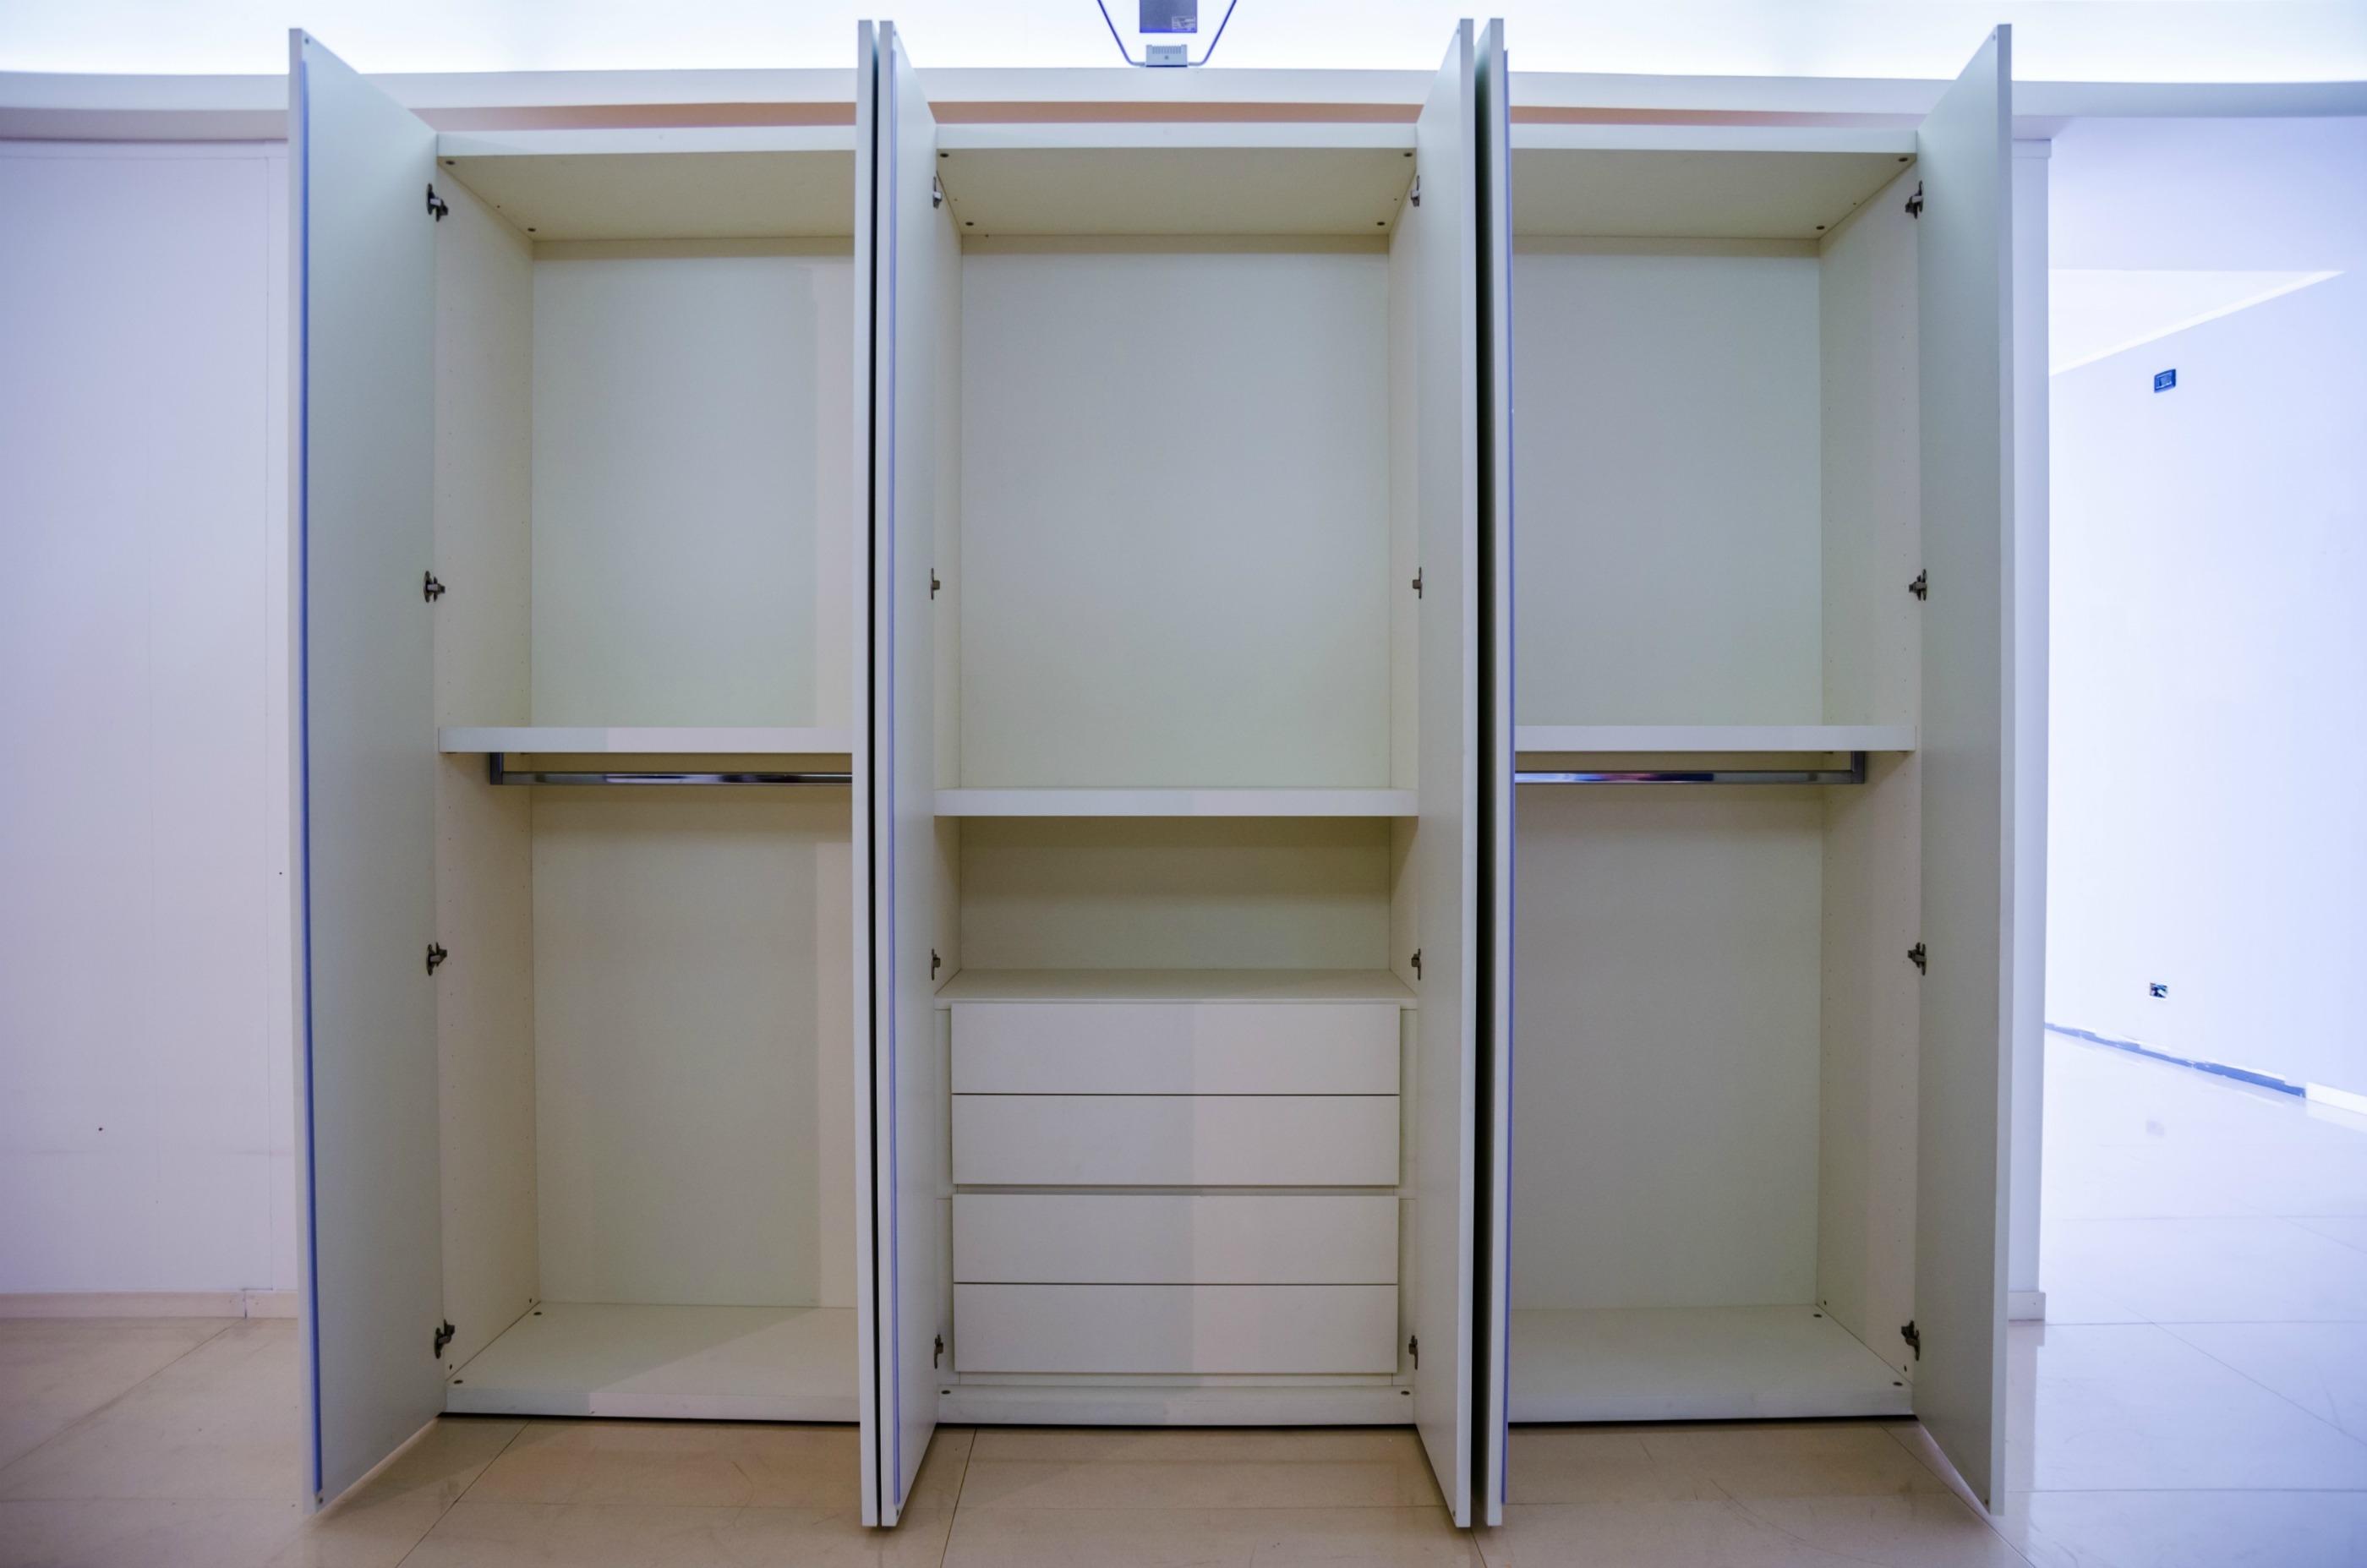 Cabina armadio piccola misure awesome misure cabina armadio with cabina armadio piccola misure - Ikea armadi a muro ...